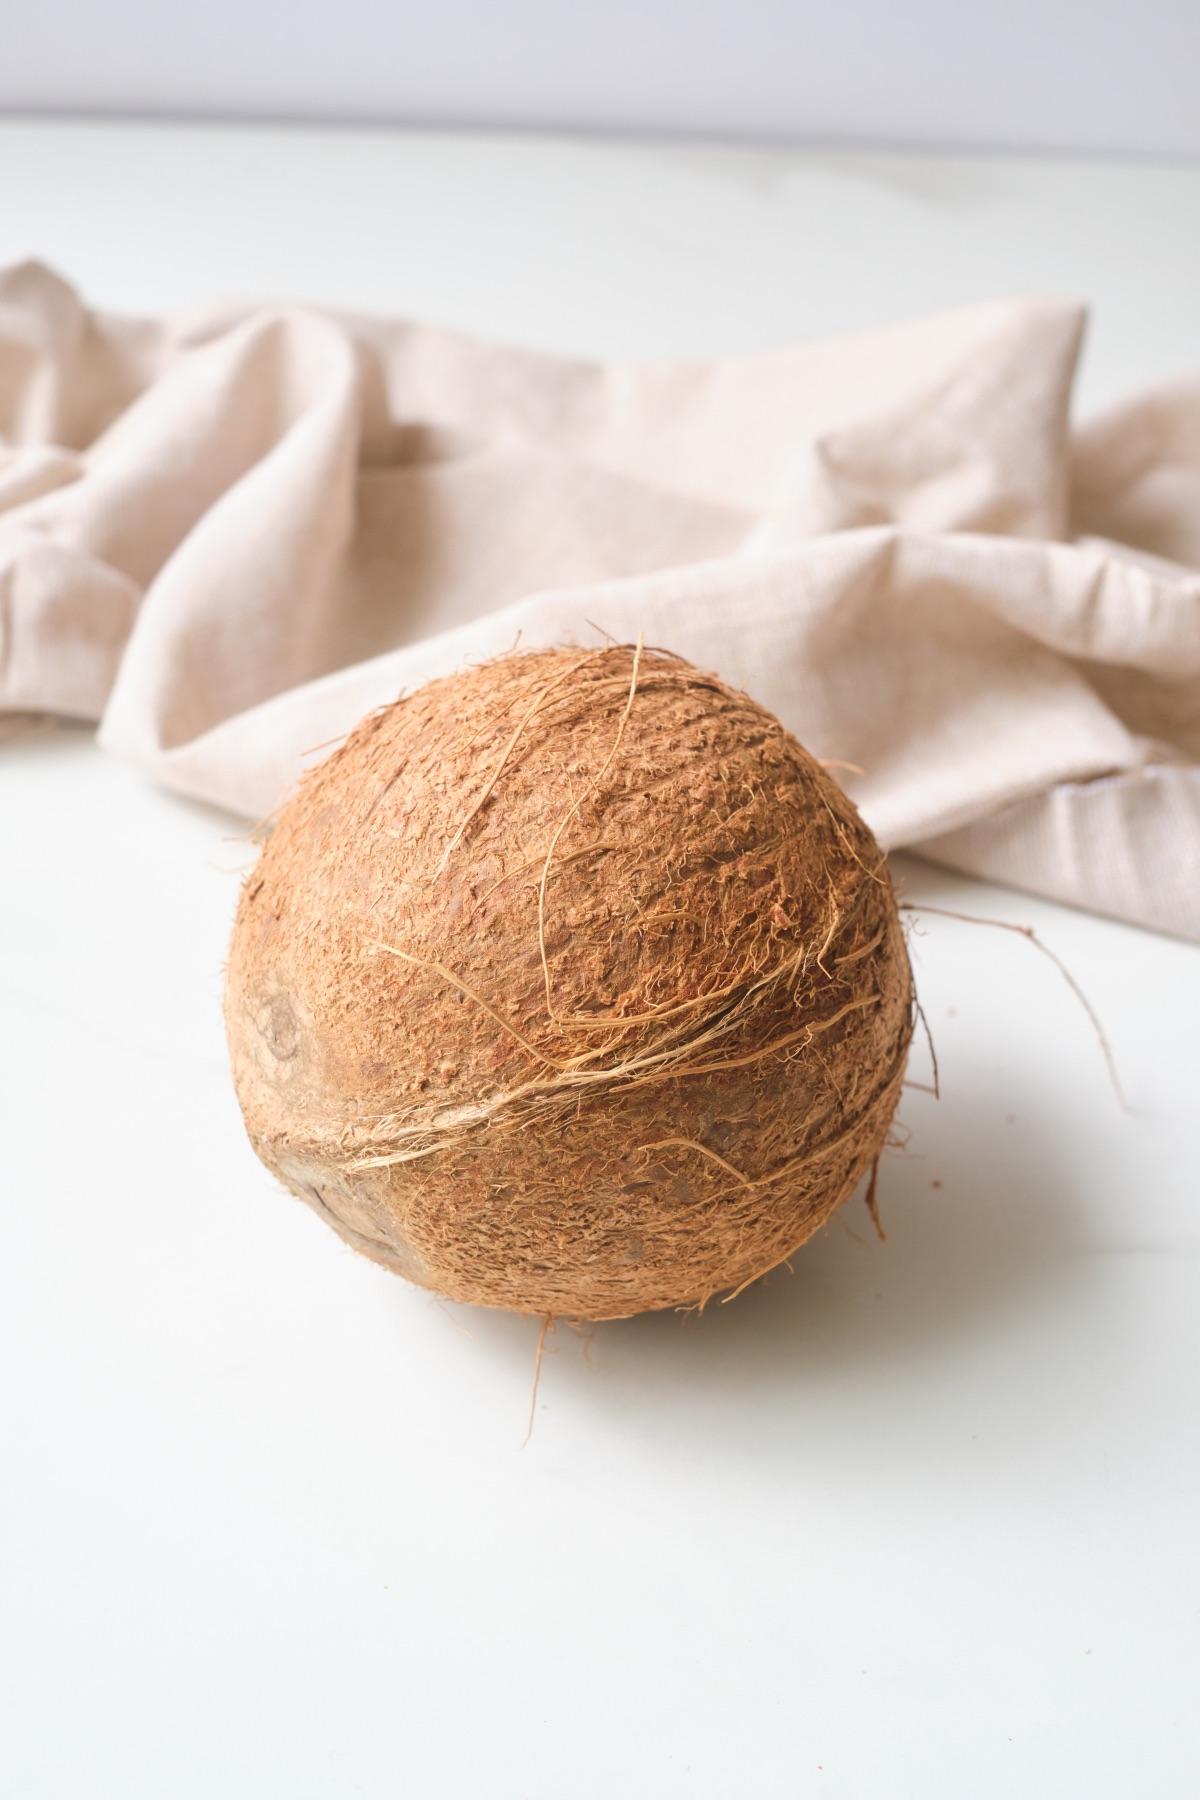 coconut ingredients to make fresh coconut milk